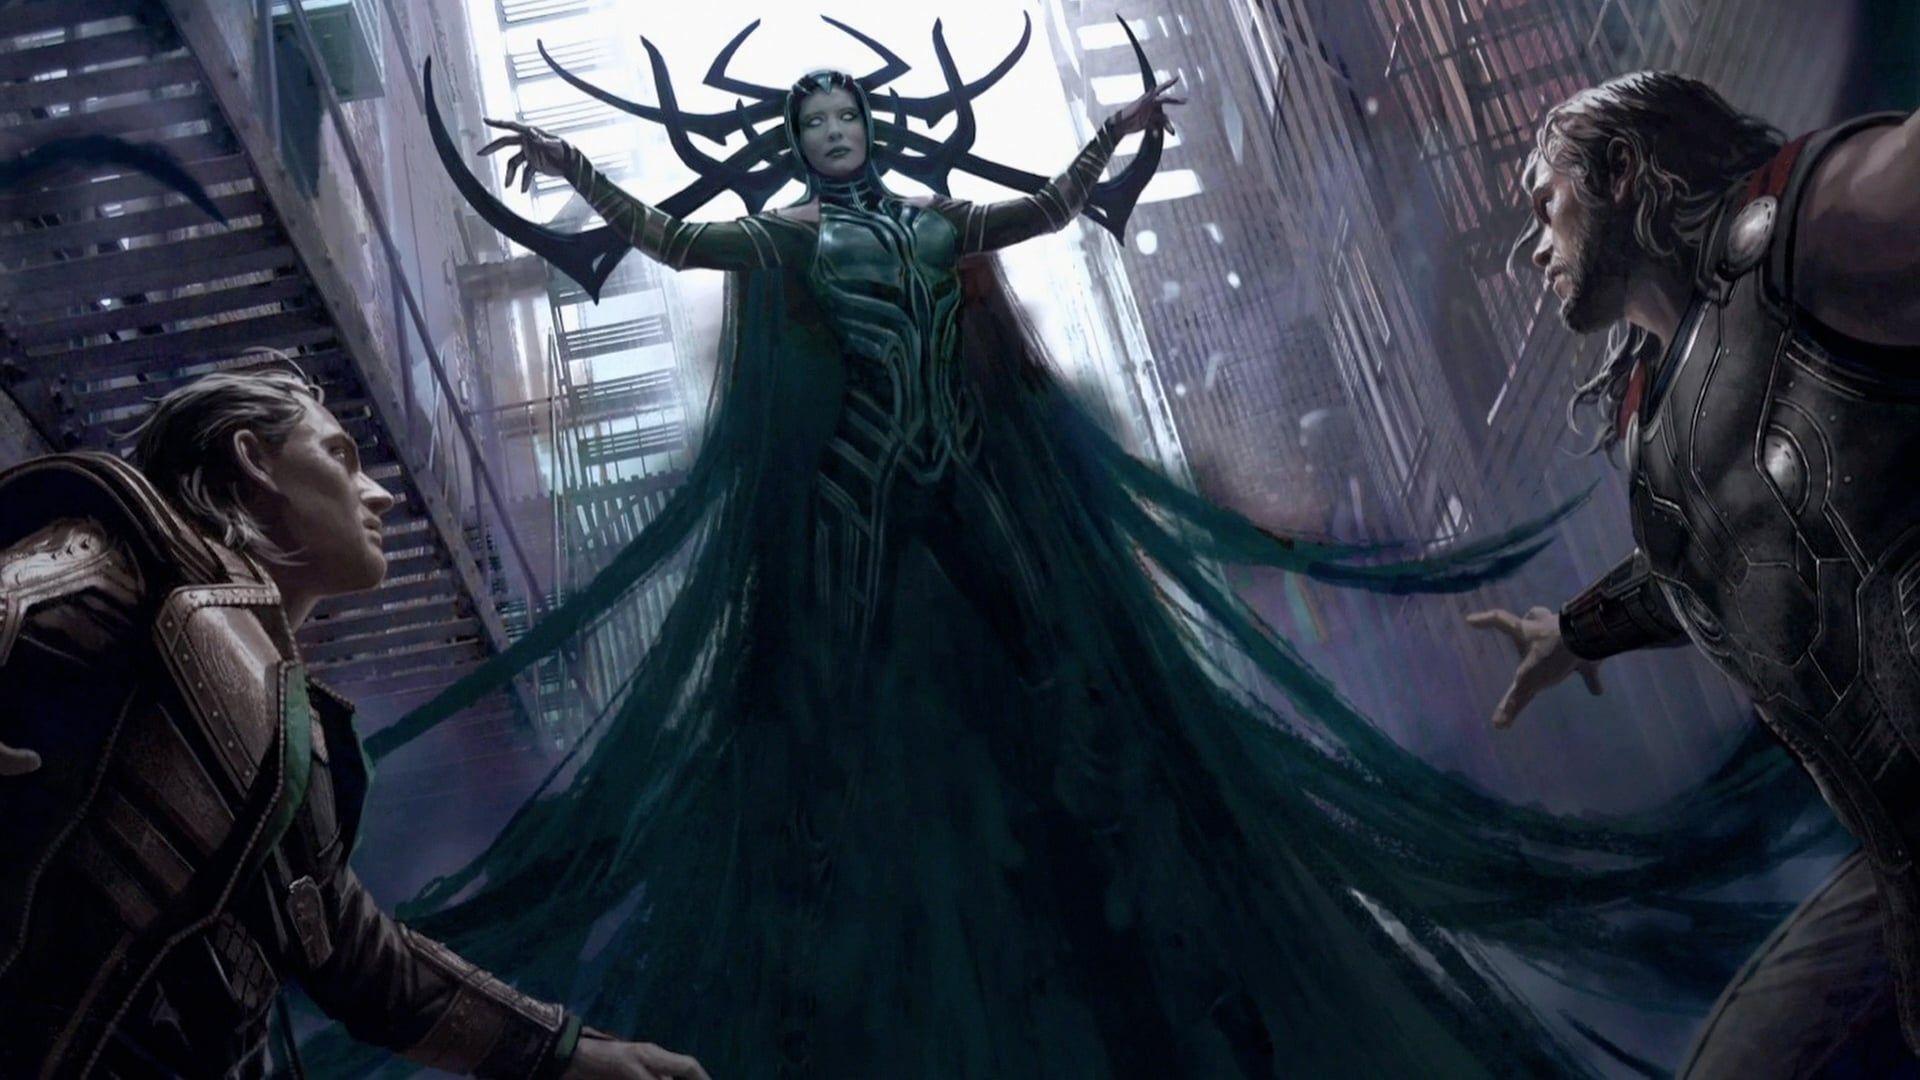 Thor Ragnarok 2017 Online Teljes Film Filmek Magyarul Letoltes Hd Thor Ragnarok 2017 Teljes Film Magyarul Online Hd Thor Ragnarok 2017 Telj Marvel Loki Thor